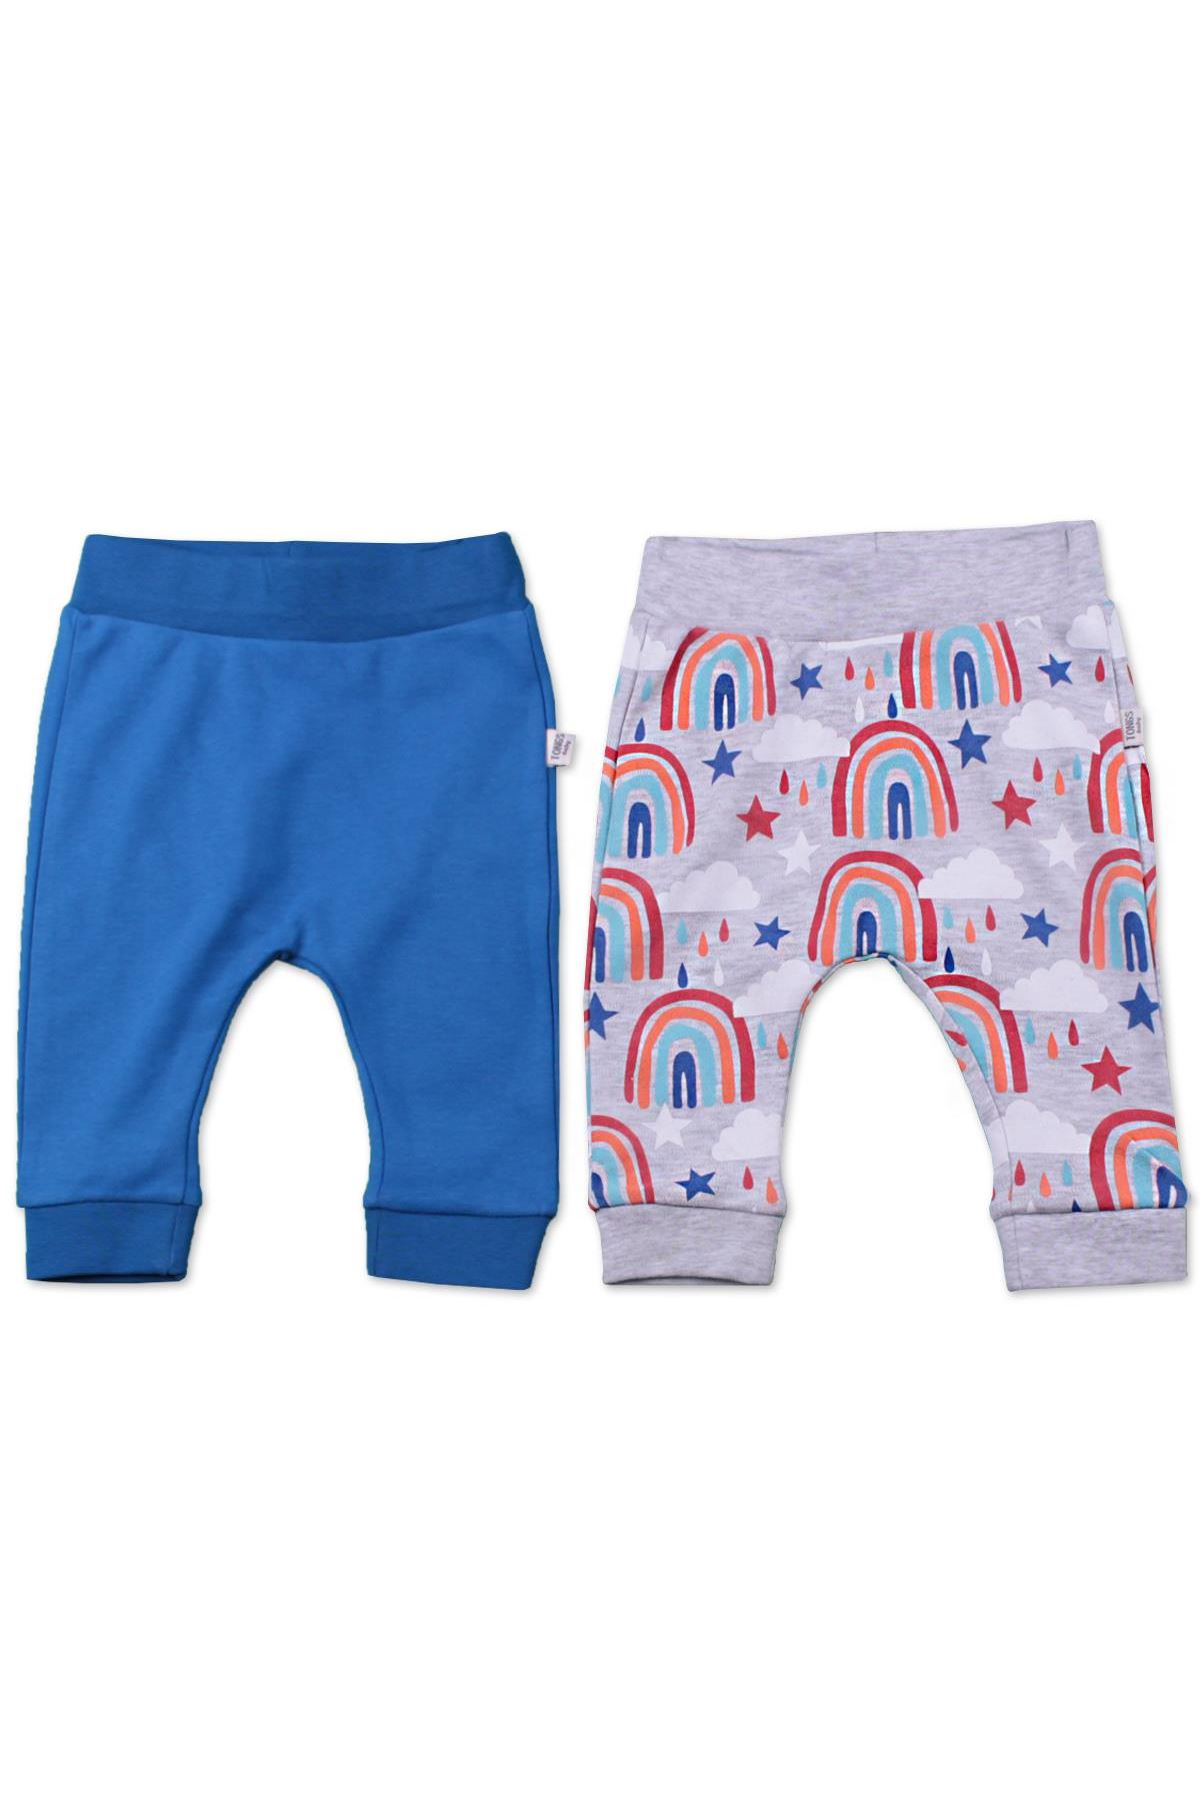 Tongs Baby Tek Alt Pantolon 3130 Mavi